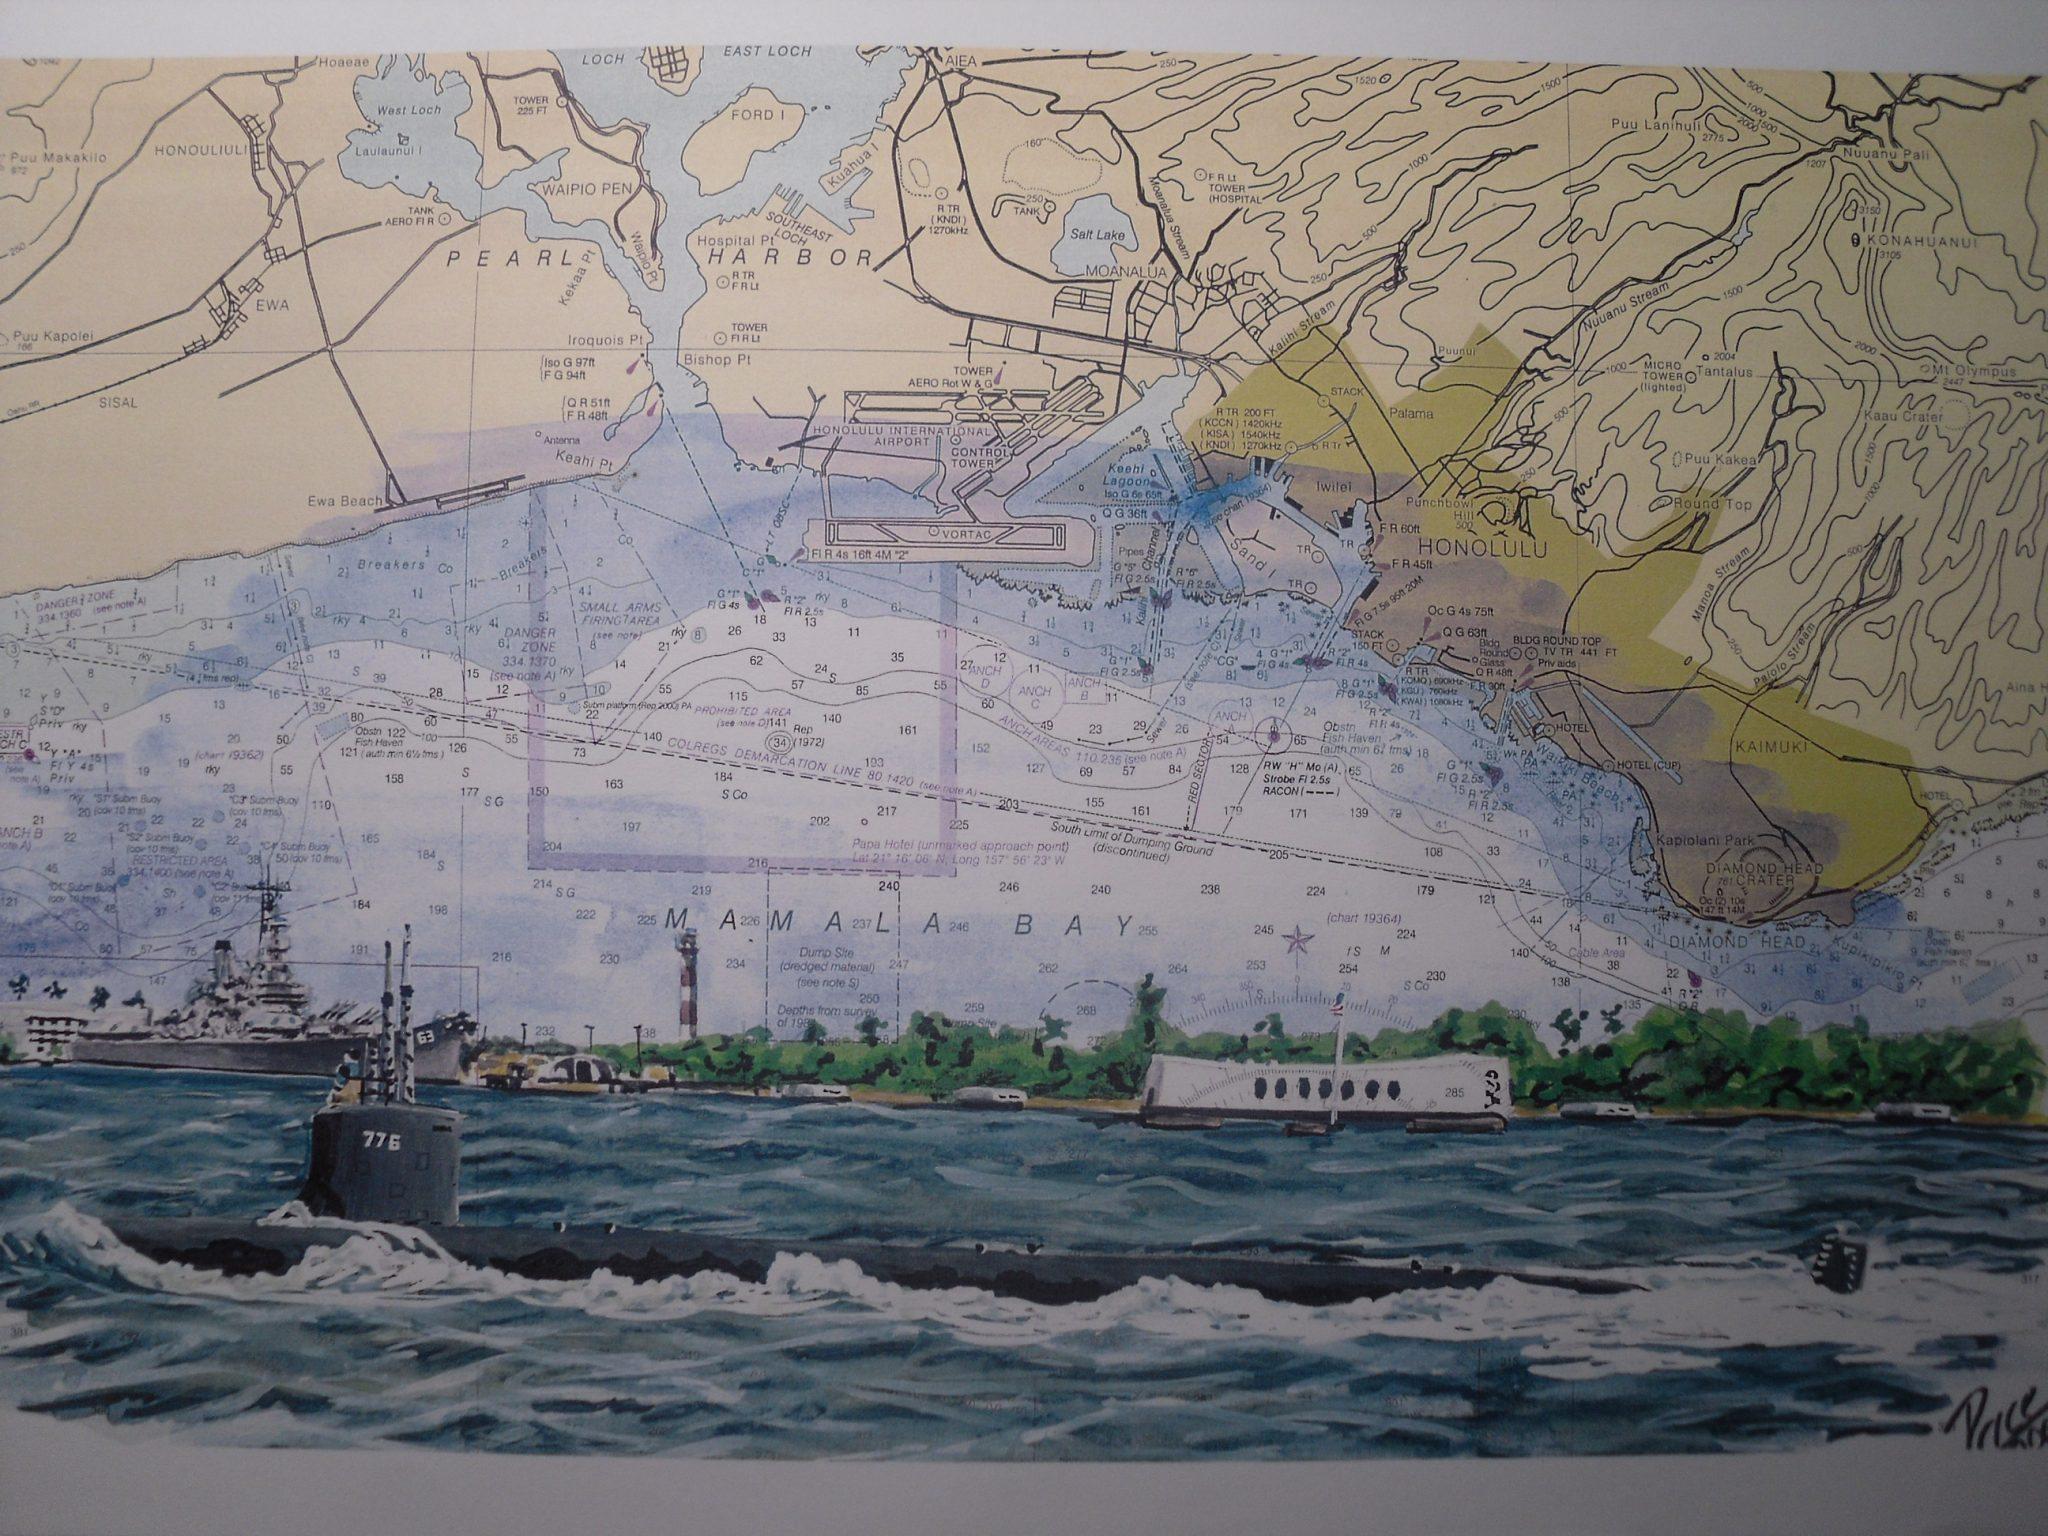 USS Hawaii SSN 776 Passing Arizona Memorial - Submarine artwork by Daniel Price